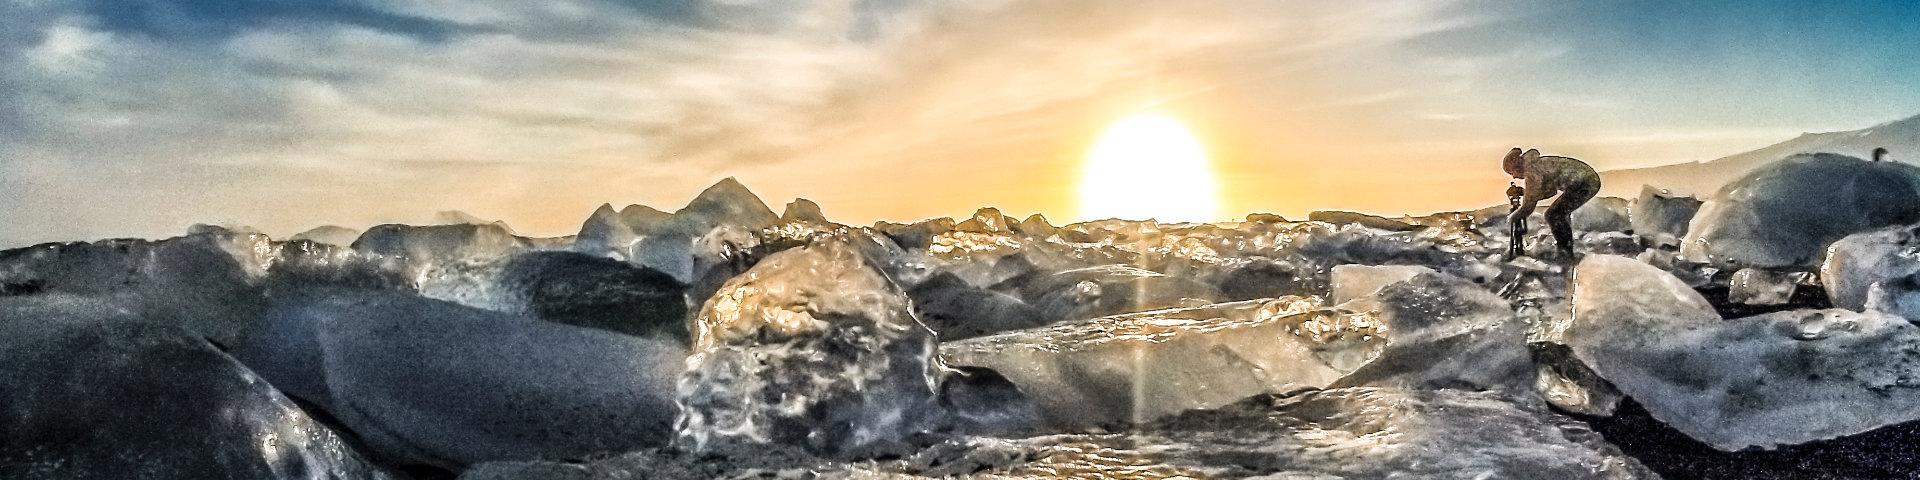 Glacier Lagoon / Black Beach